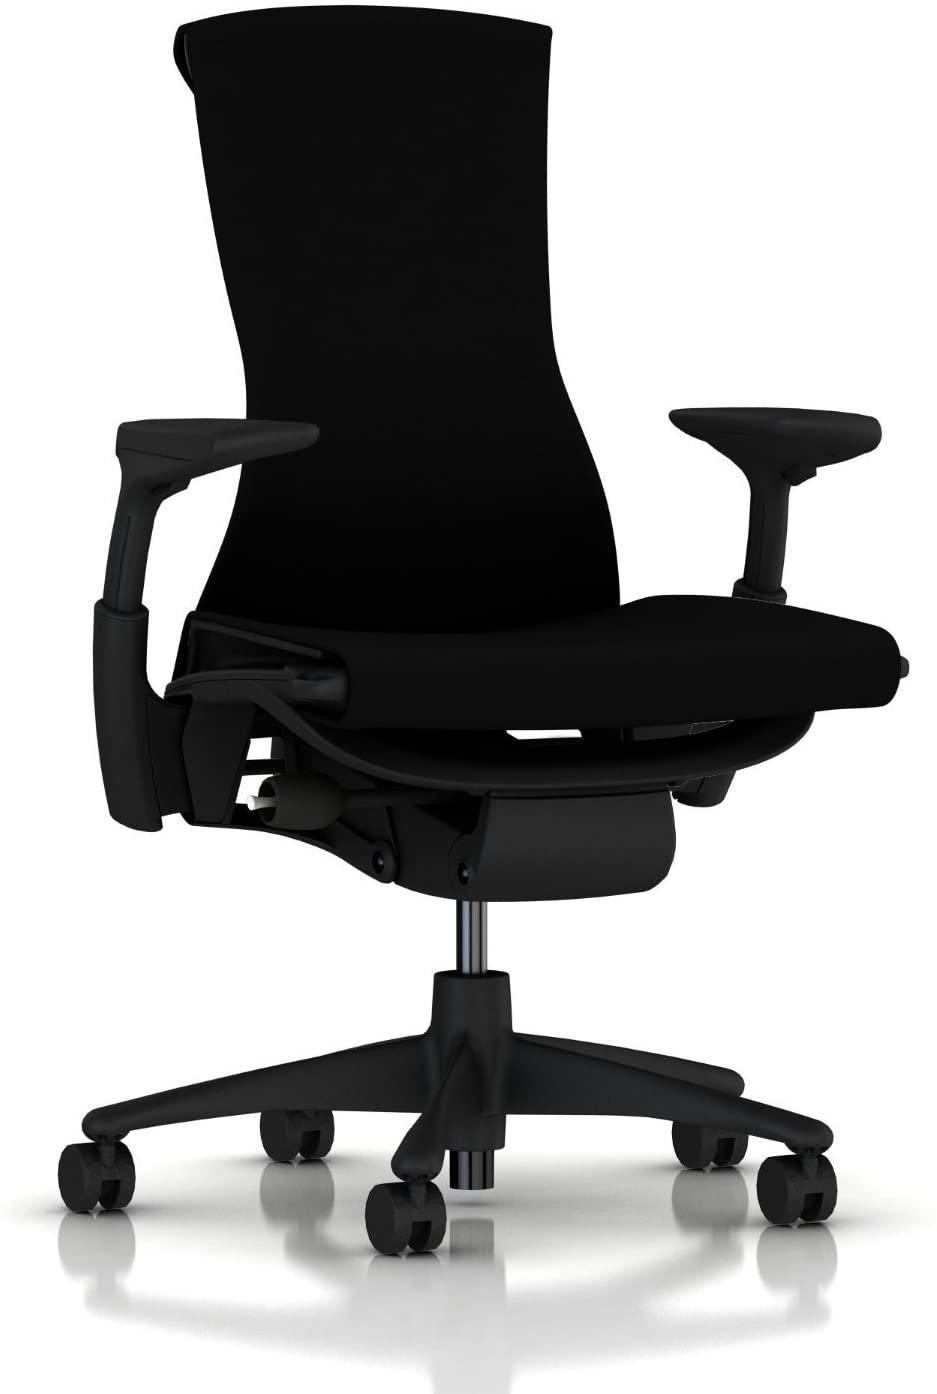 herman miller chair image